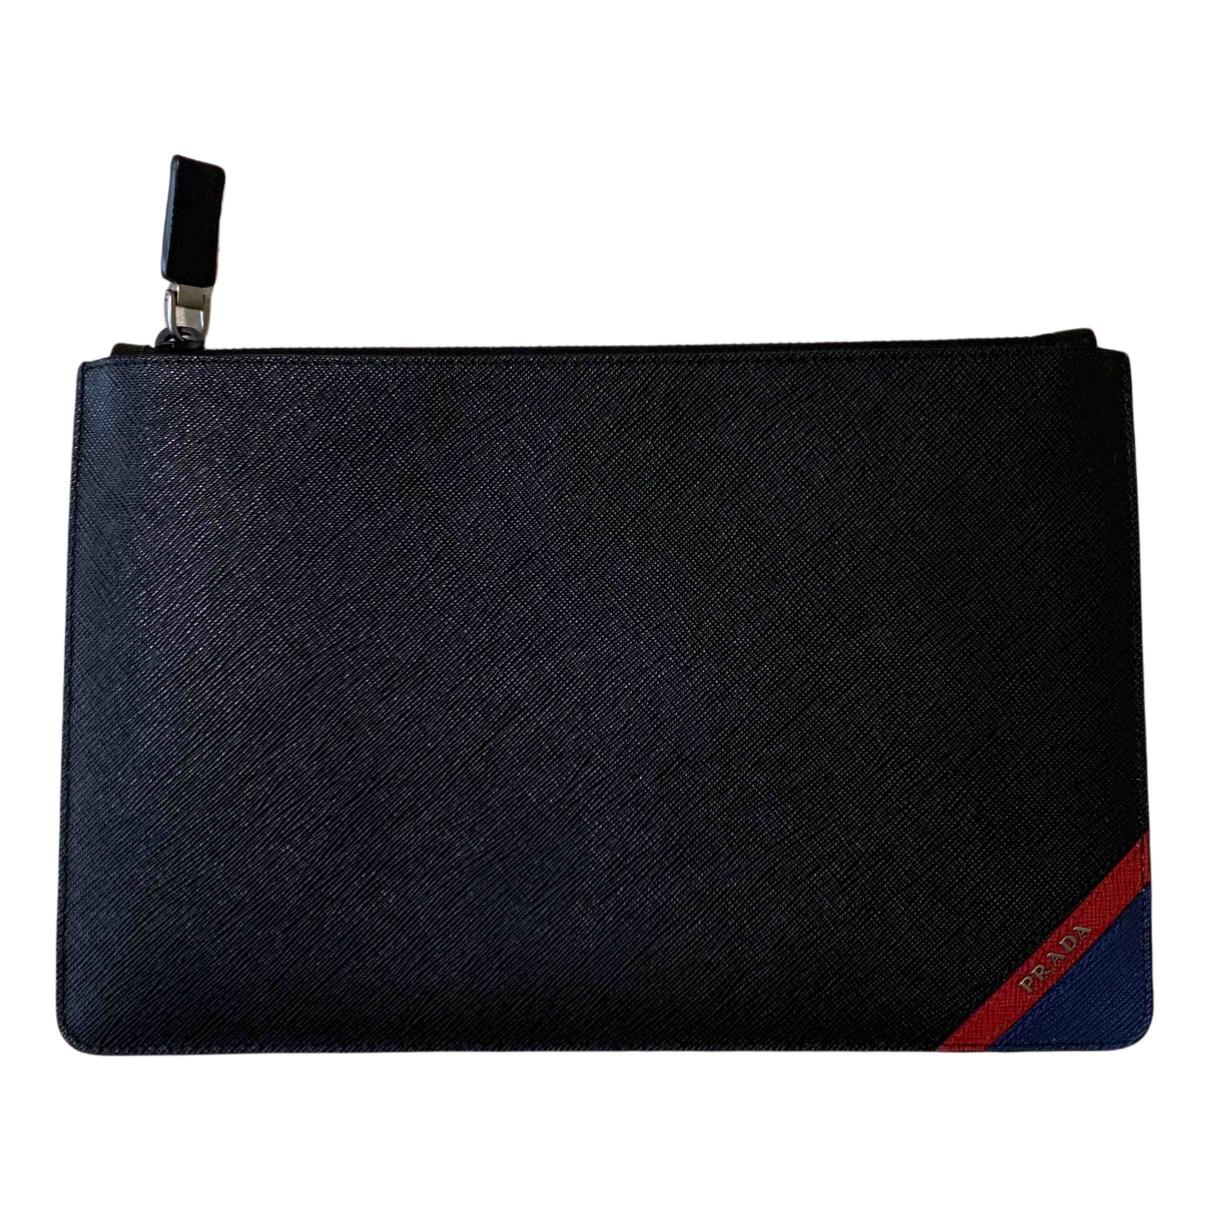 Prada N Black Leather Small bag, wallet & cases for Men N